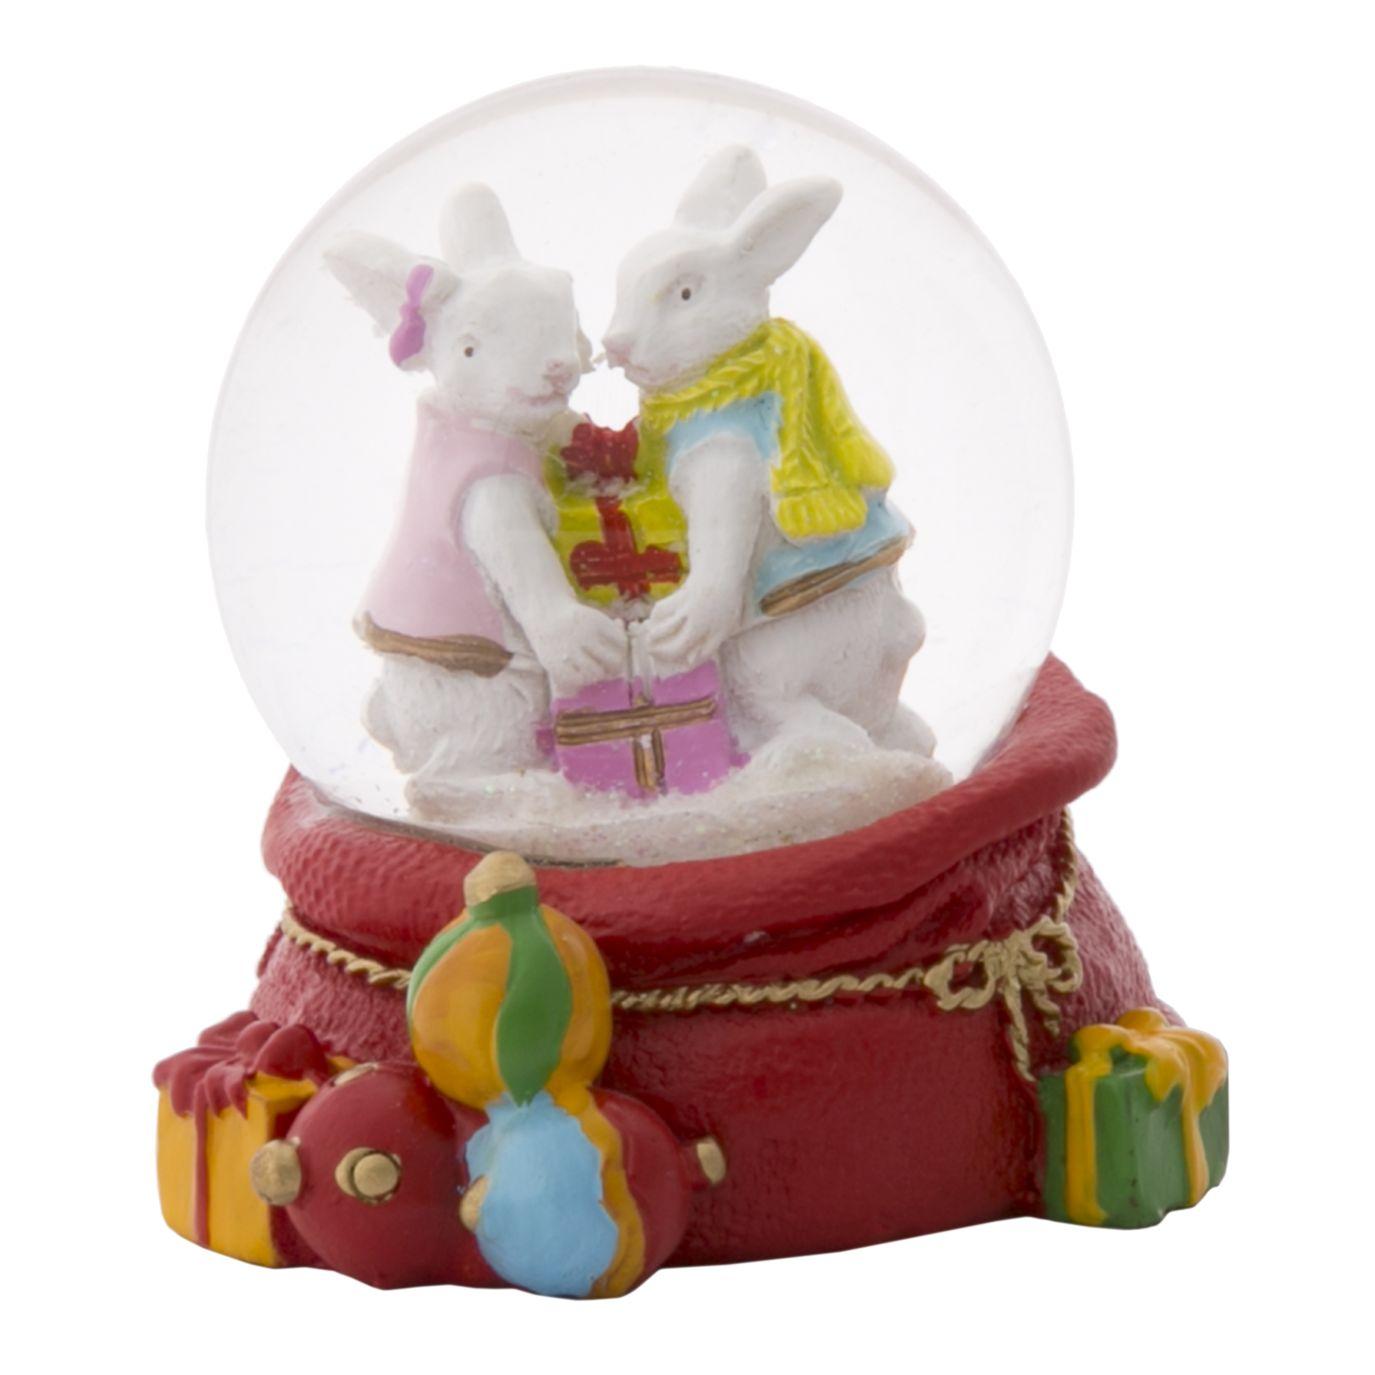 НГ Сувенир Снежный шар Зайчики с подарками